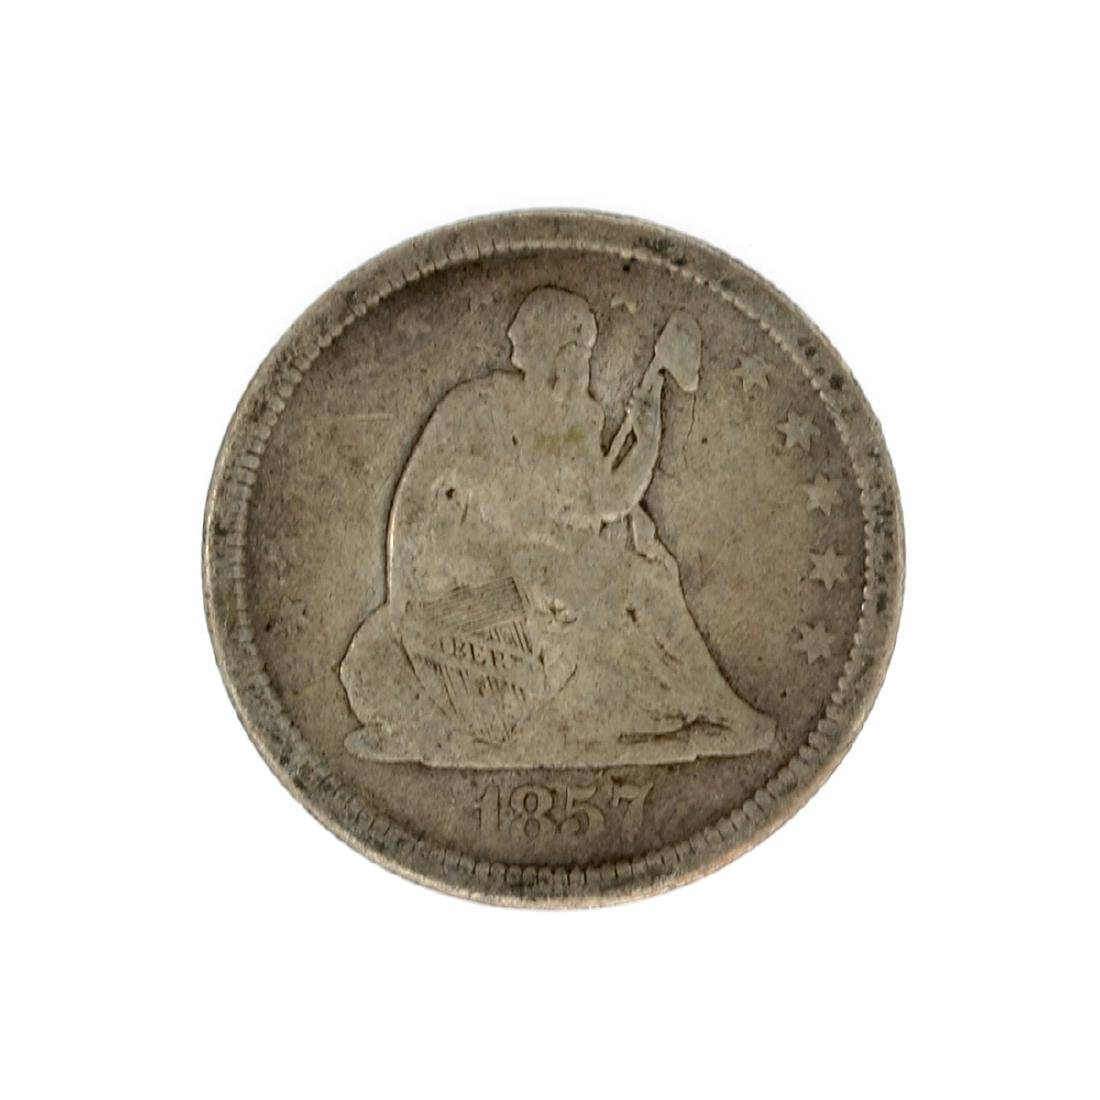 1857 Liberty Seated Quarter Dollar Coin